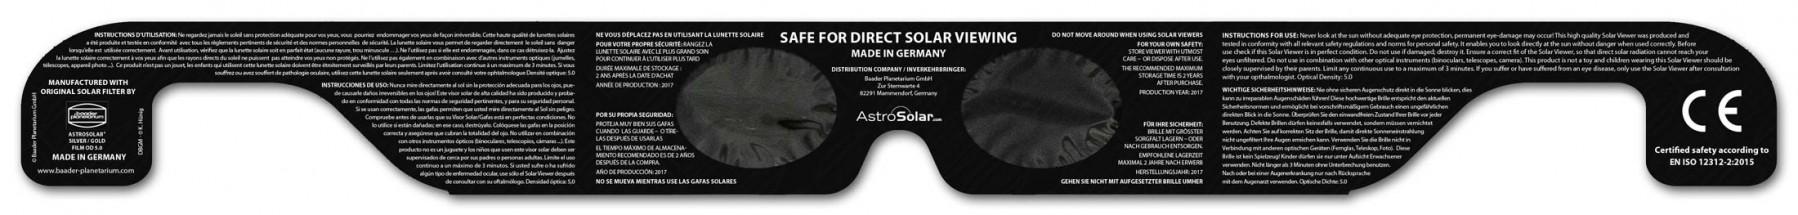 Solar Viewer AstroSolar® Silver/Gold - Rückseite